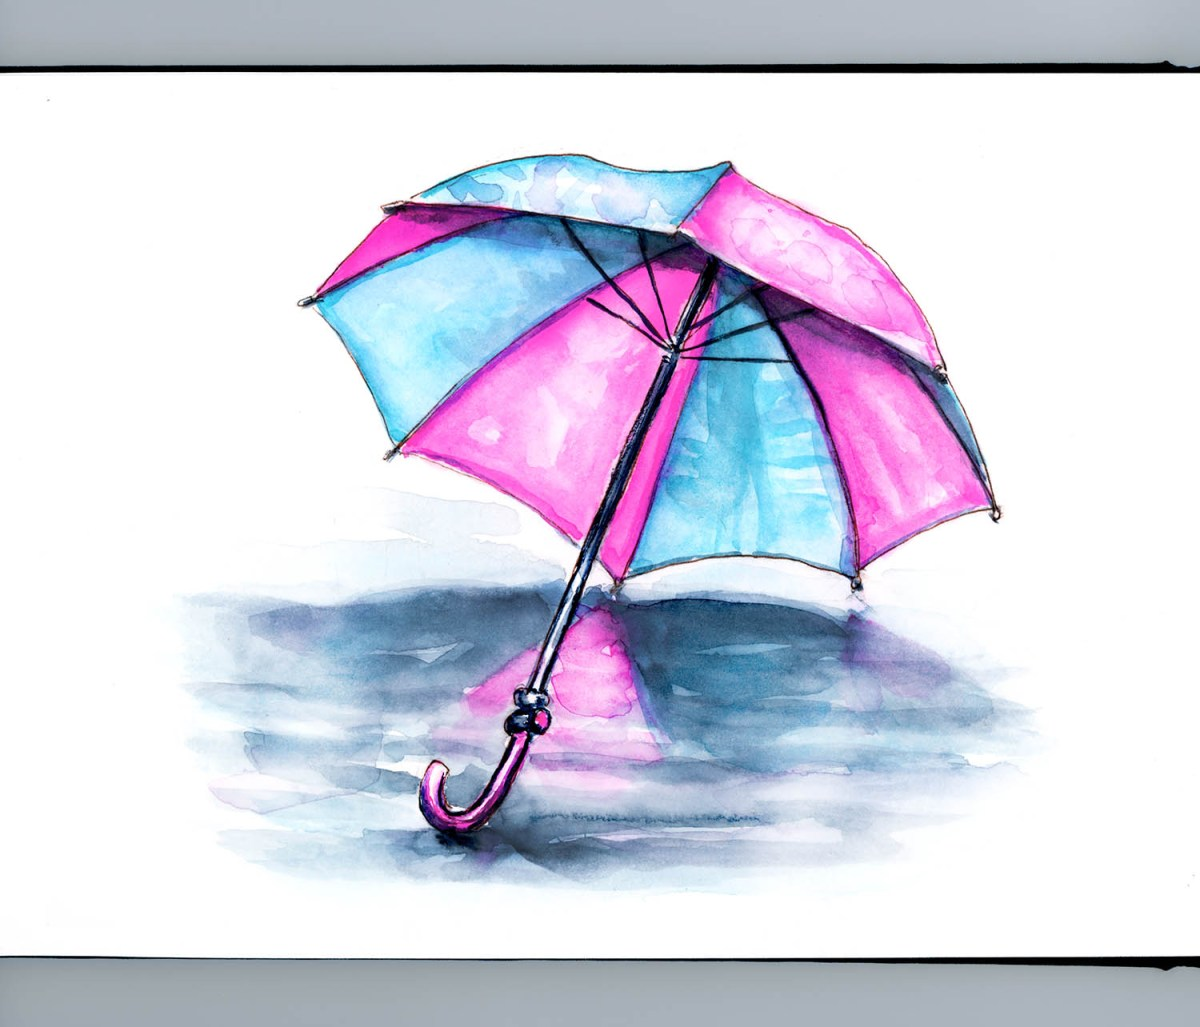 Day 21 - Rainy Days_IG_